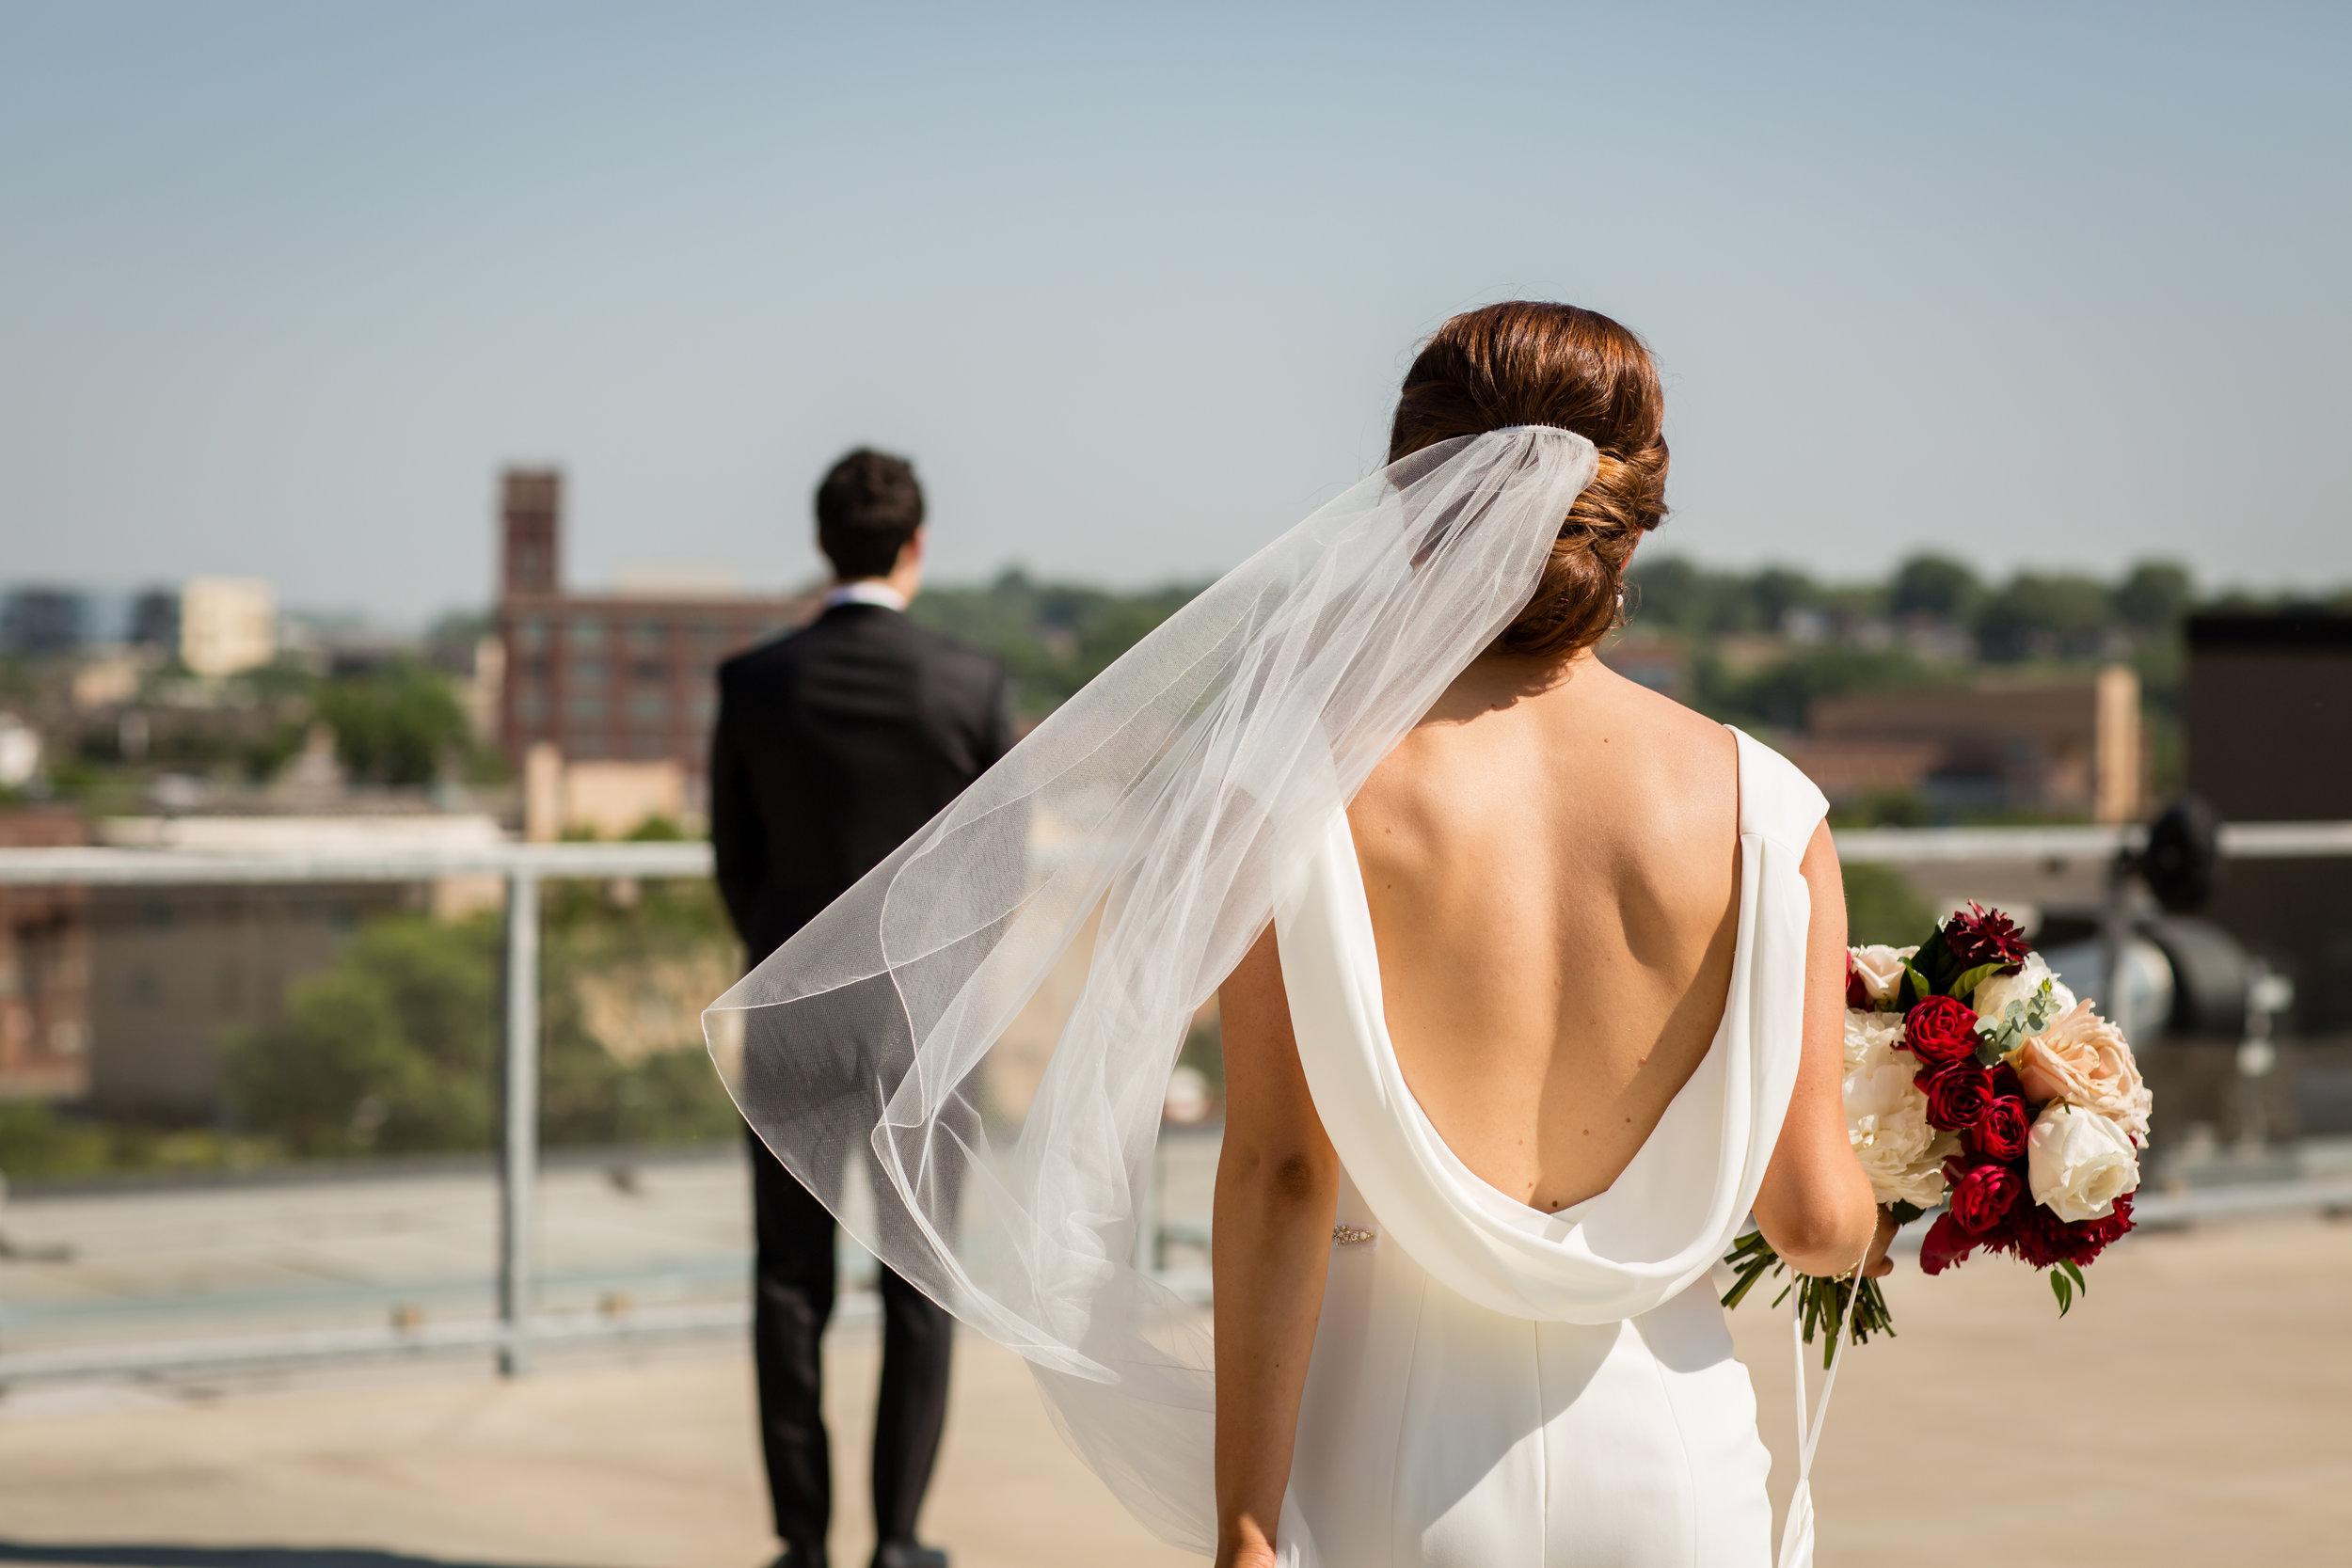 Aversa Wedding 6.10.17-035.JPG